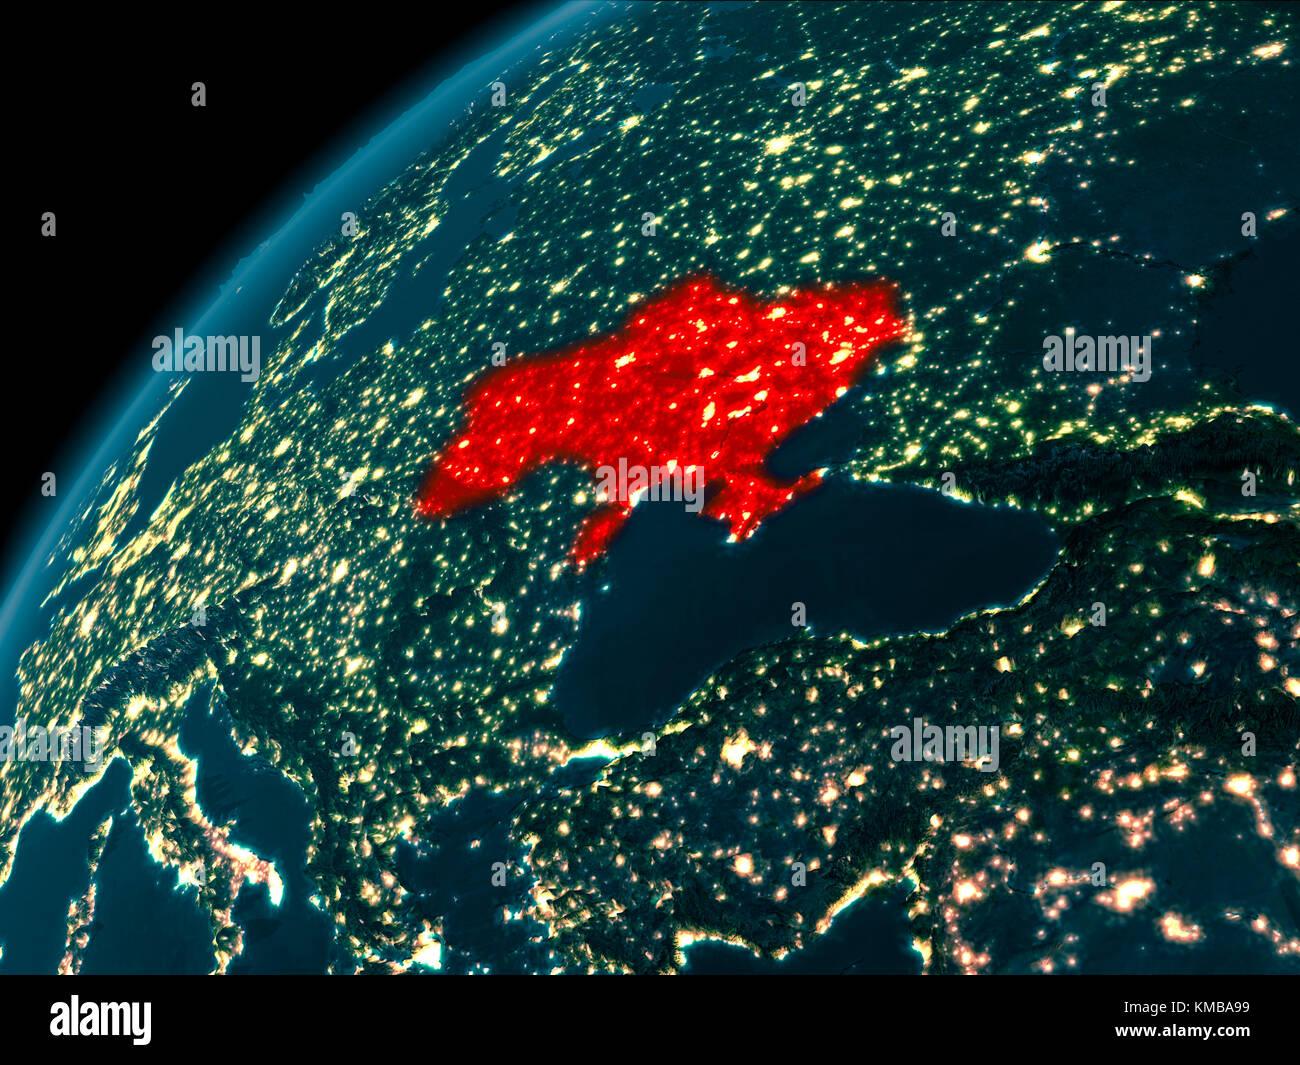 Satellite Map World Night Stock Photos & Satellite Map World ... on japan at night, middle east at night, united kingdom at night, italy at night, russia at night, romania at night, asia at night, mexico at night, empire state chrysler building at night, london at night, globe at night, north korea at night, china at night, u.s at night, home at night, planet earth at night, high resolution earth at night, africa at night, full chrysler building at night, usa at night,